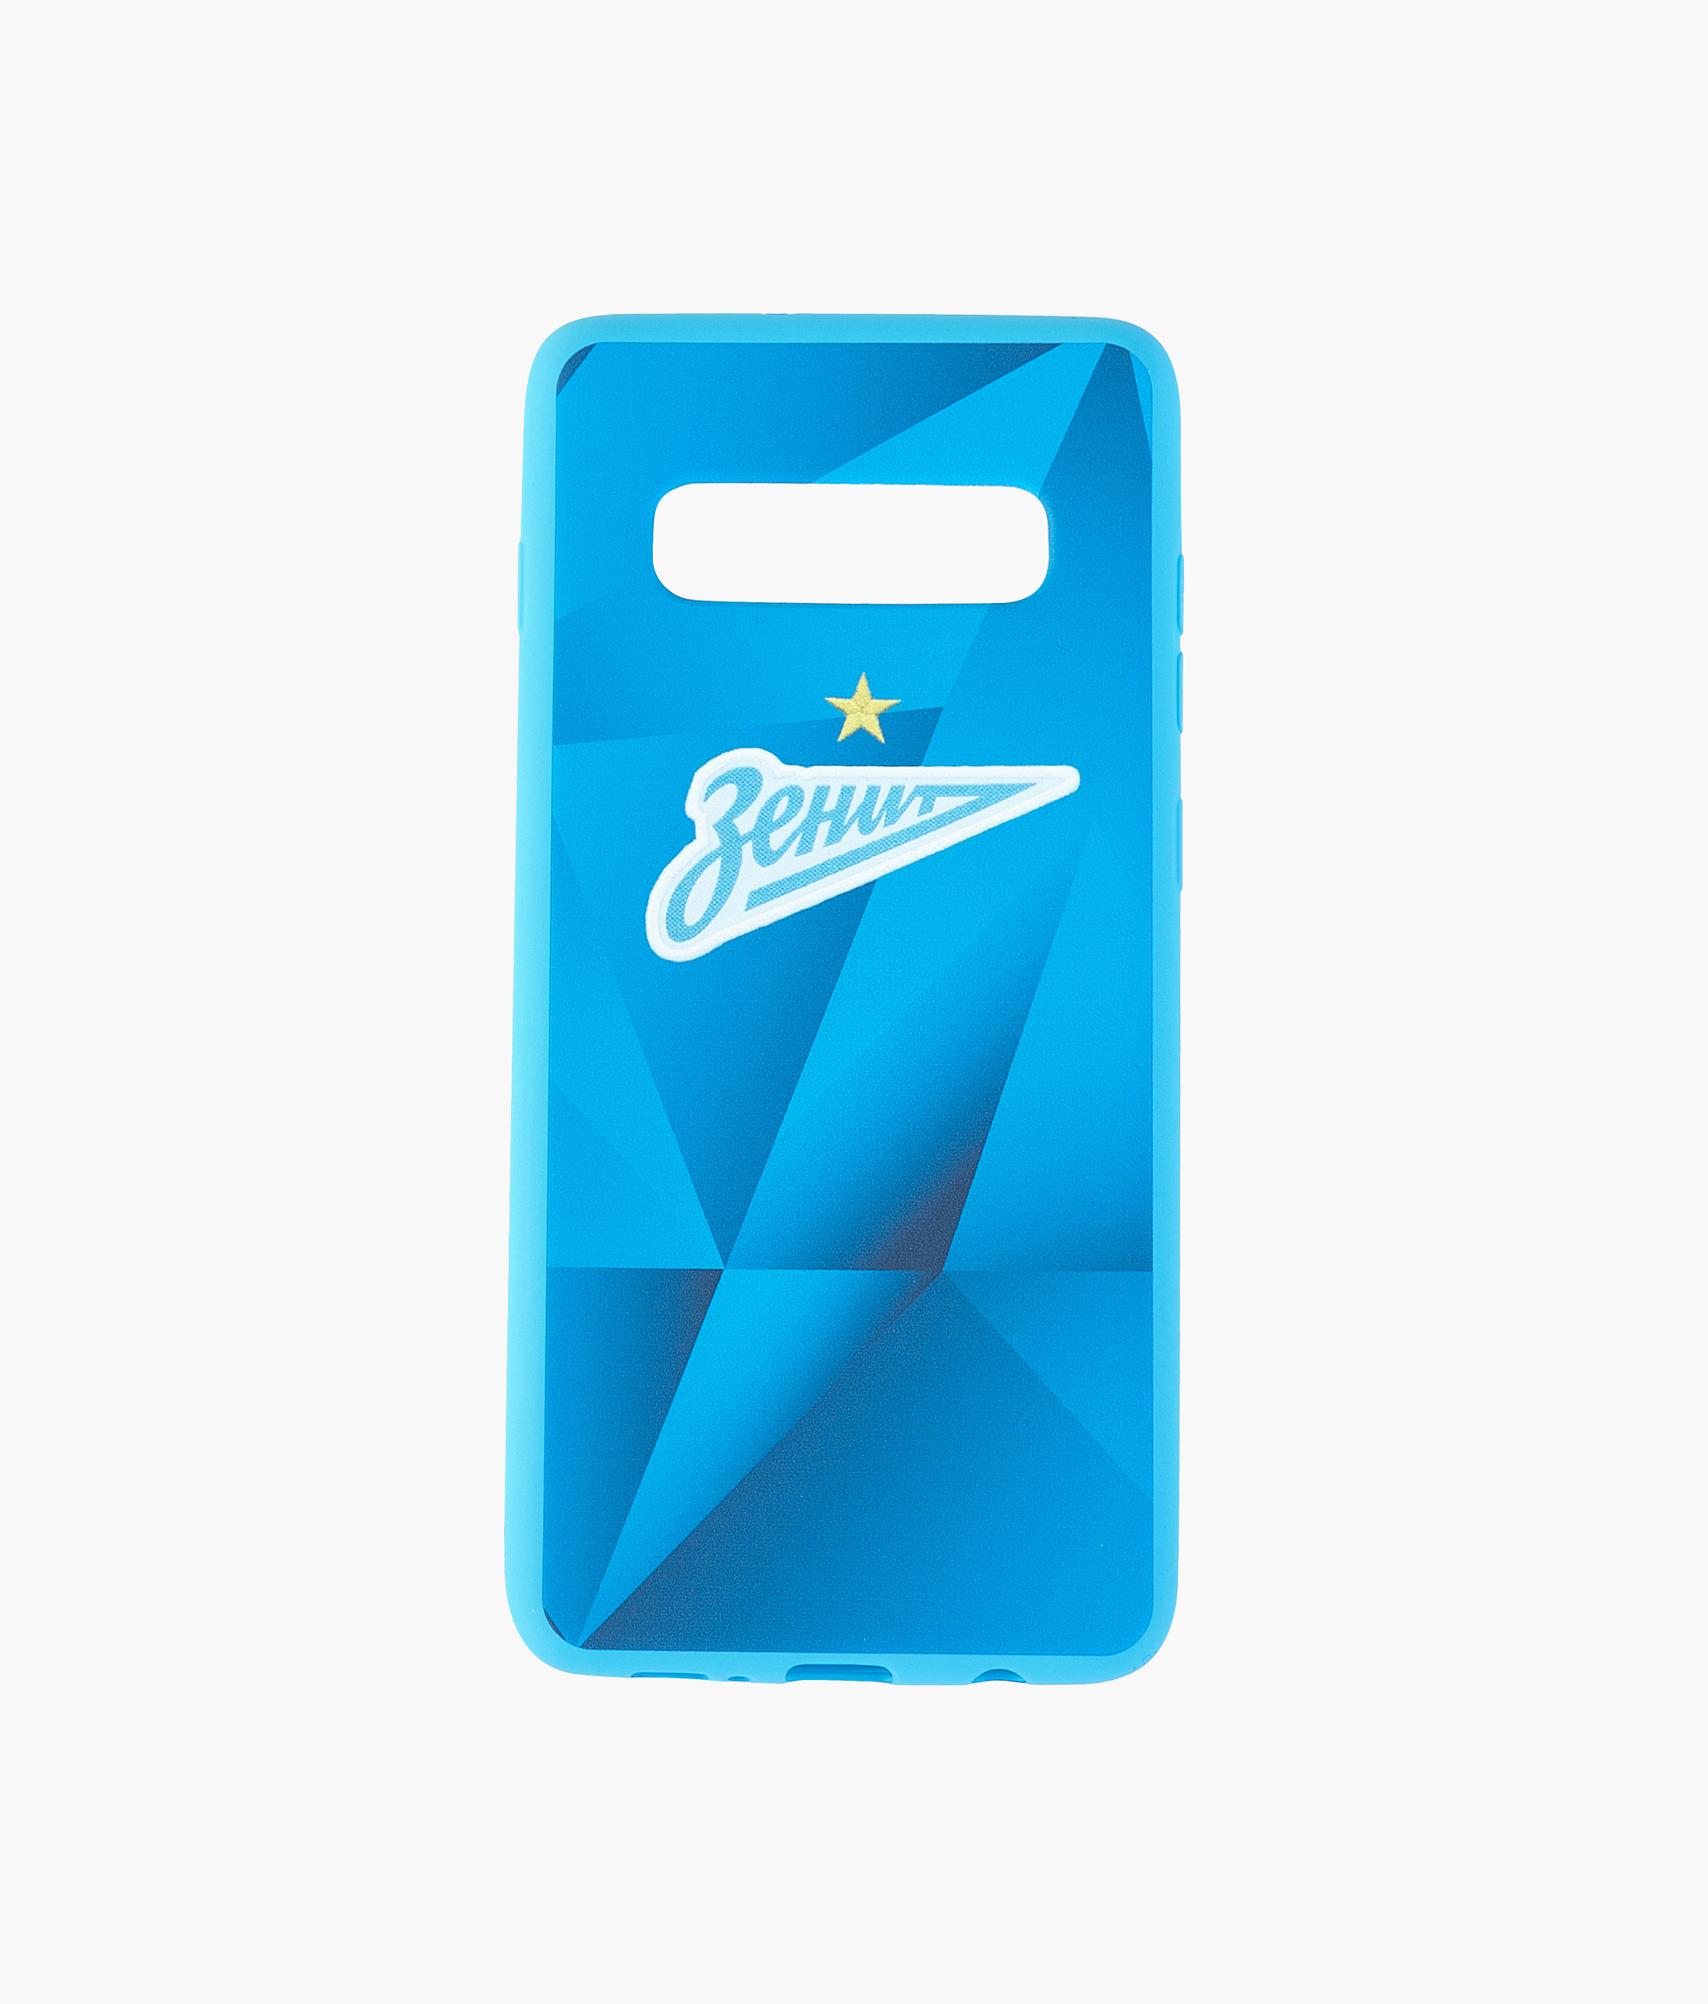 Фото - Чехол для Samsung Galaxy S10 Plus Форма 2019/20 Зенит аксессуар чехол neypo для samsung galaxy a10 2019 soft matte silicone dark blue nst11681